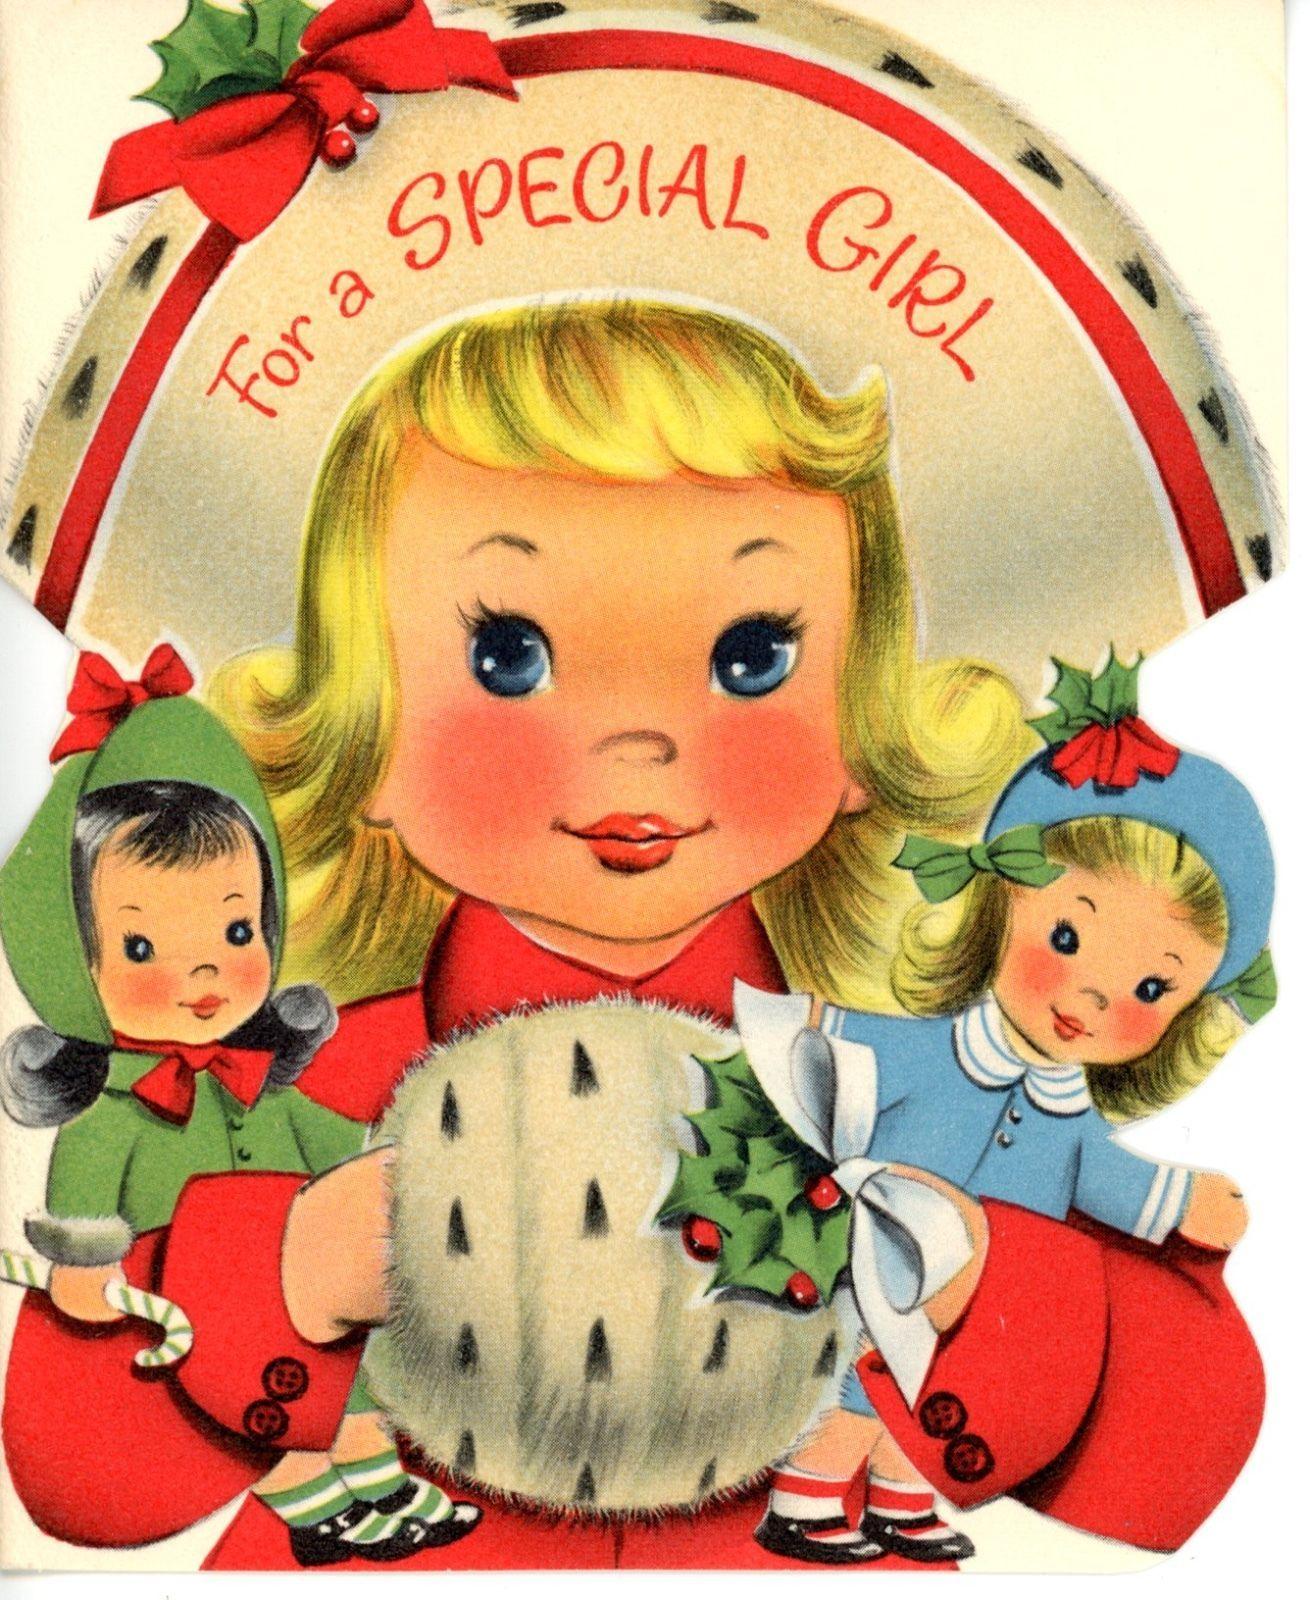 Vintage norcross christmas greeting card girl w 2 dolls glittery vintage norcross christmas greeting card girl w 2 dolls glittery hat muff 2503 kristyandbryce Image collections